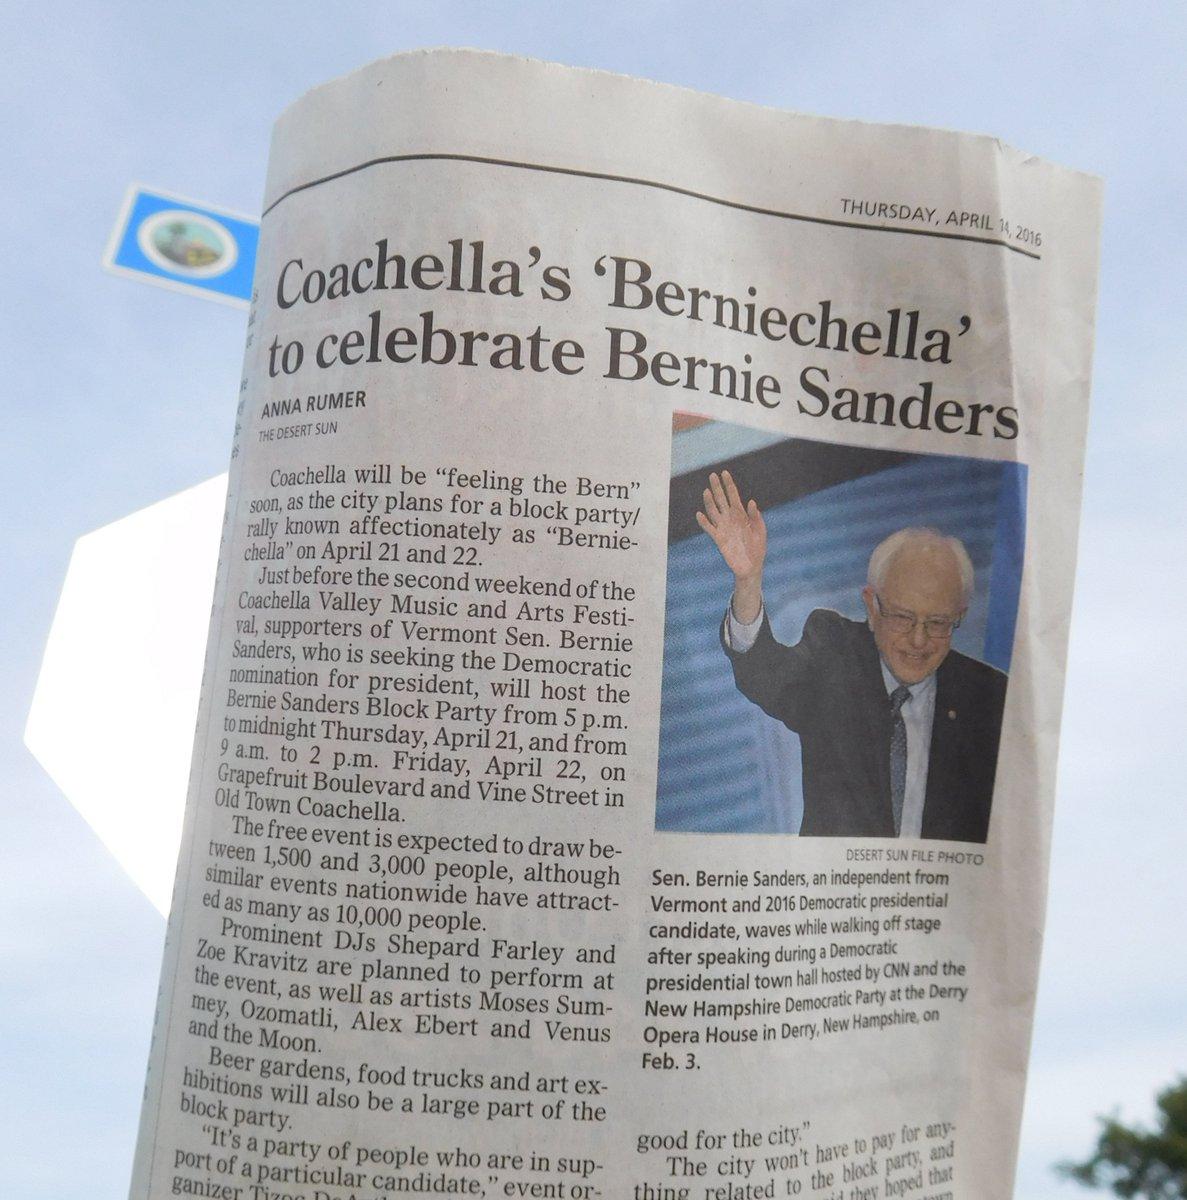 Reminder, Next week is the Bernie Sanders #FREE #BlockParty in Coachella #BERNIECHELLA 21&22 https://t.co/unMu1P3zGi https://t.co/XFa3GT5ZgX